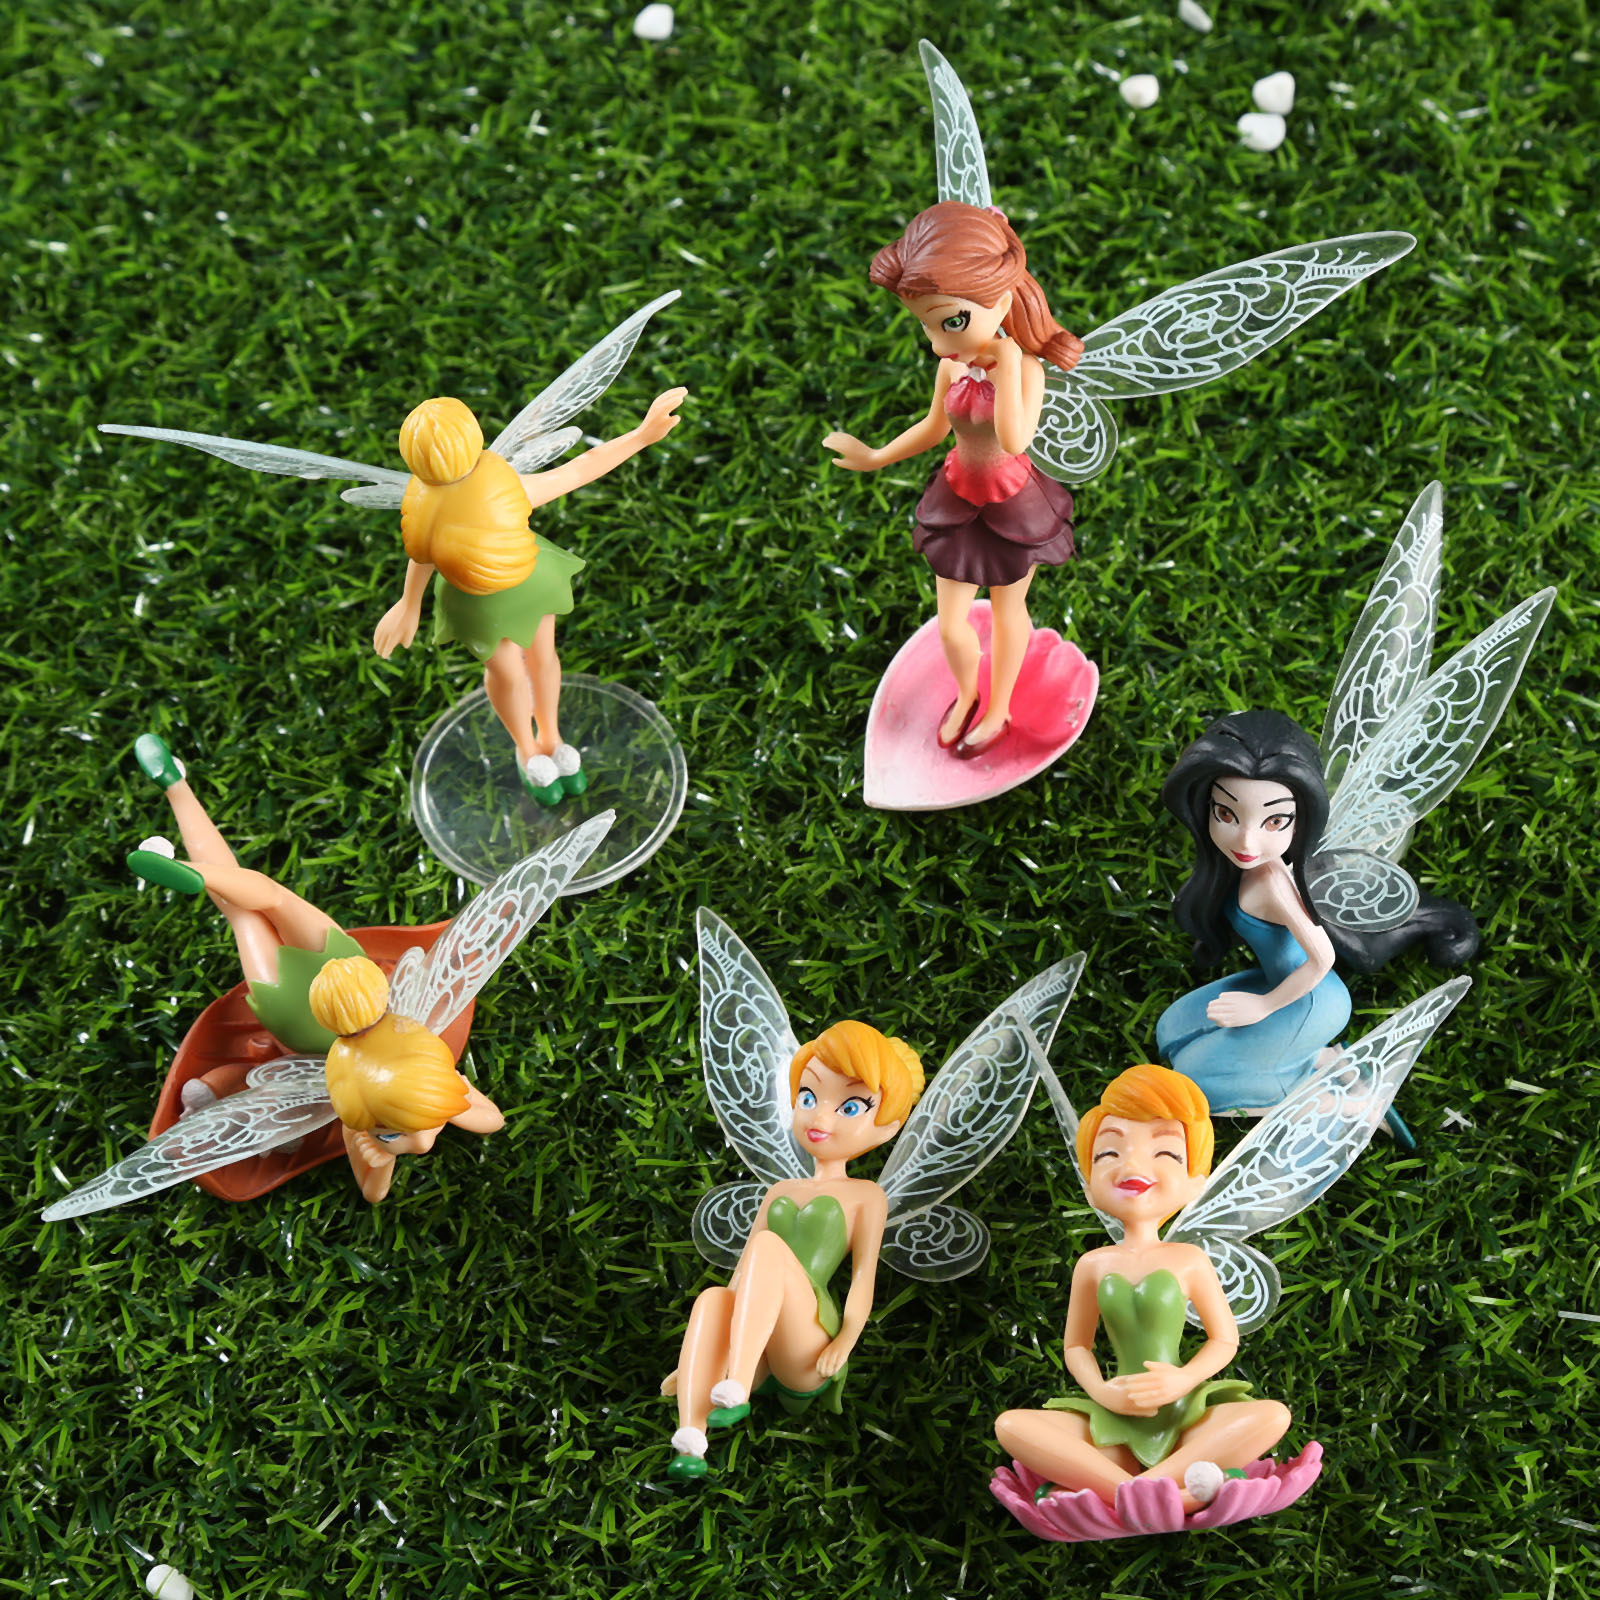 Random Beautiful Fairy Kawaii Gifts Angel Garden Decoration Resin Crafts Home Decor Miniature Fairy Garden Figurines Flower